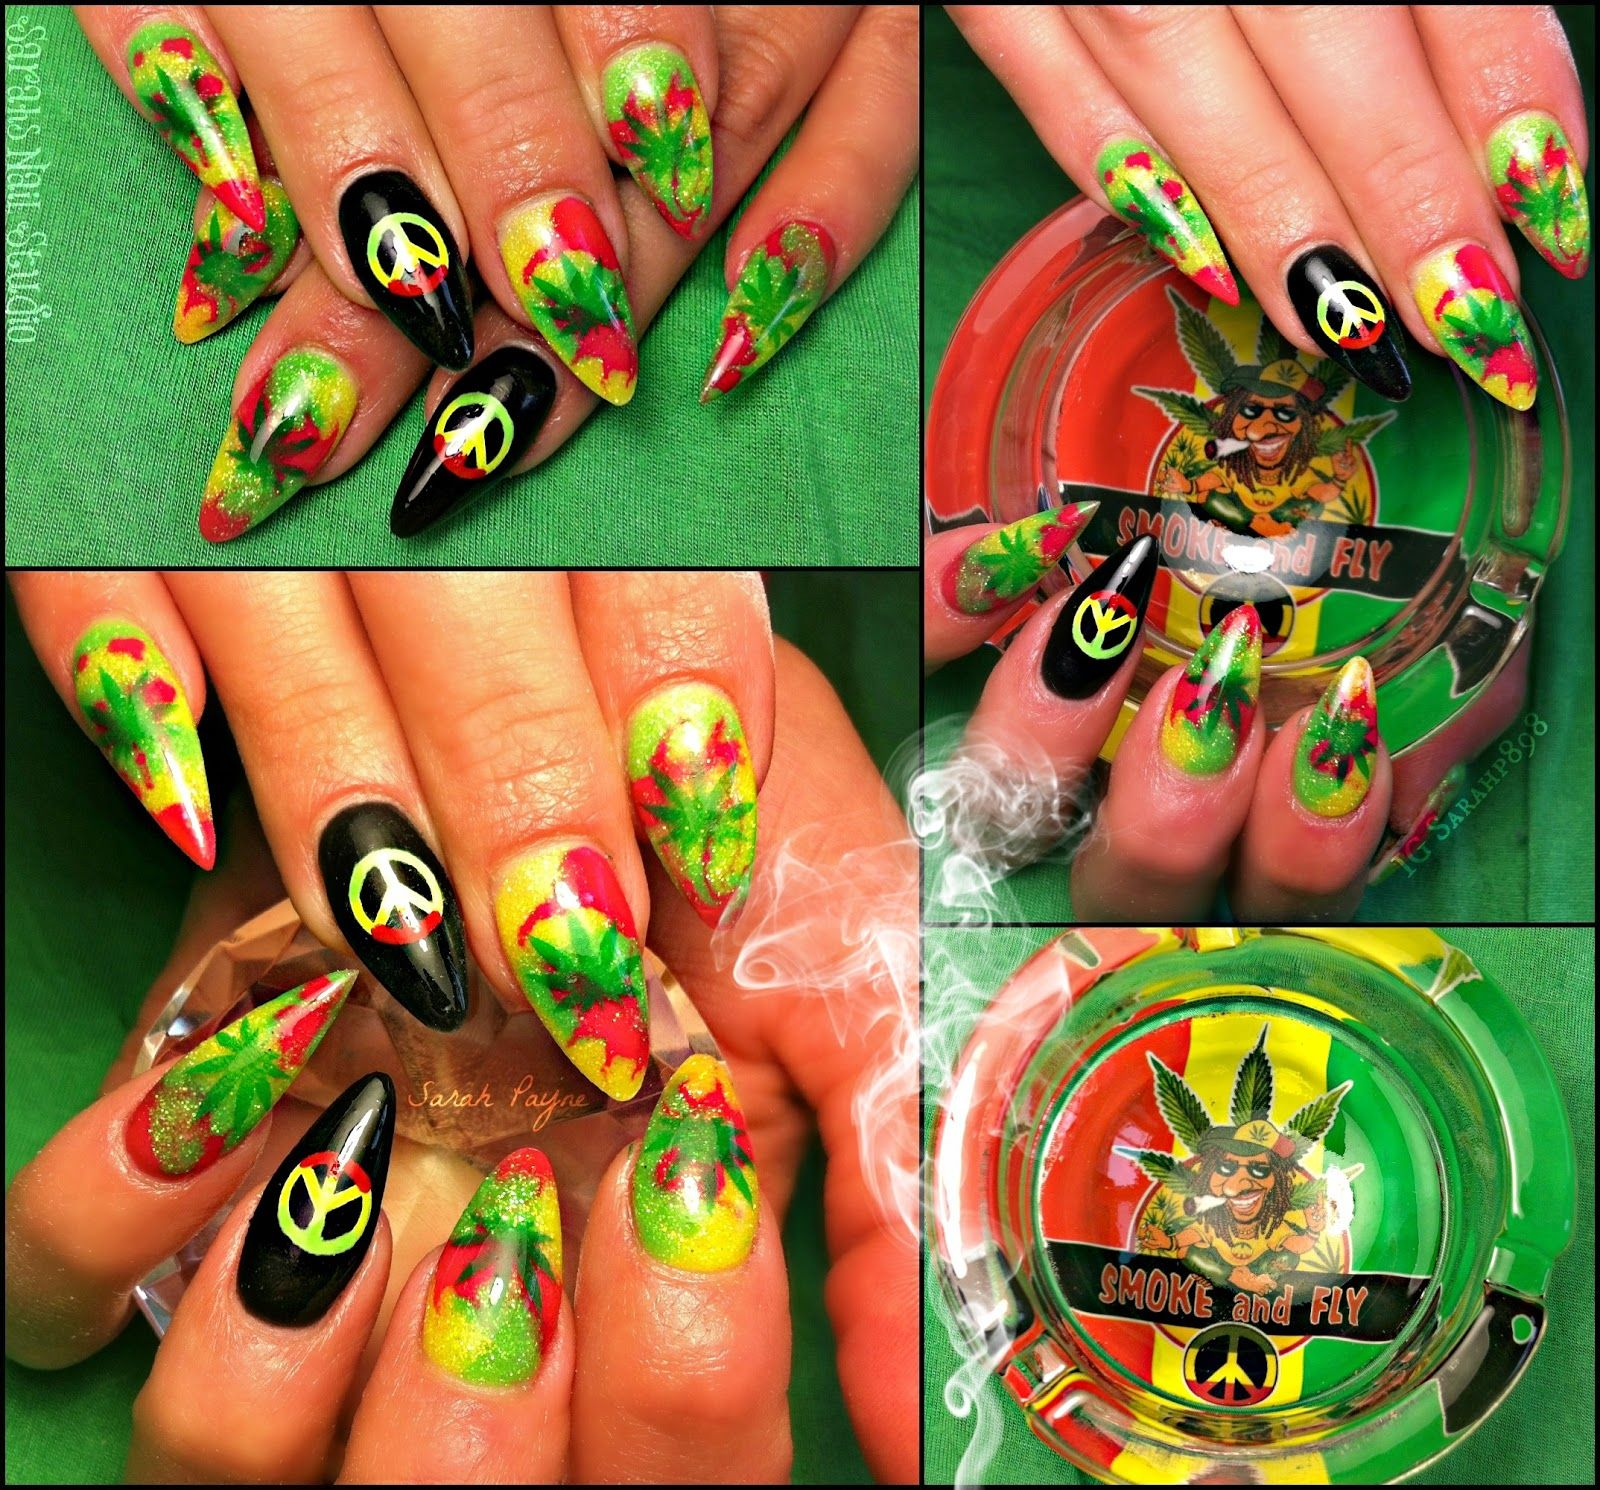 420 rasta stoner nails | Nail art and Inspiration | Pinterest ...